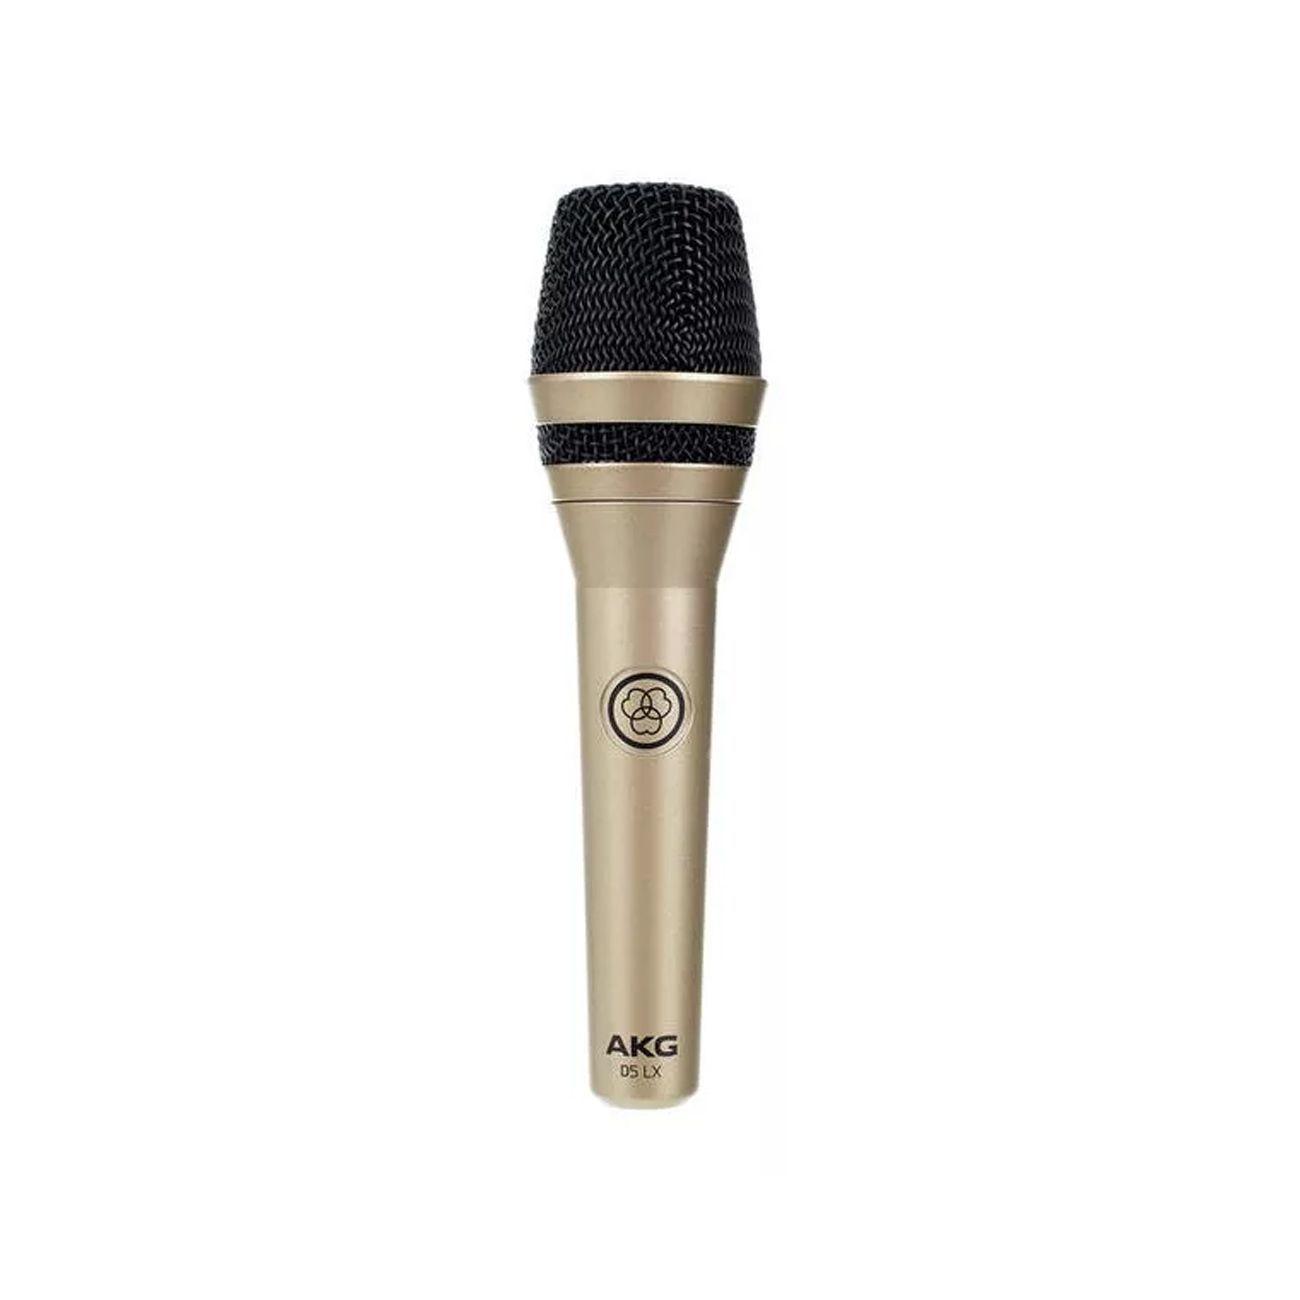 Microfone AKG D5 LX - Supercardioide